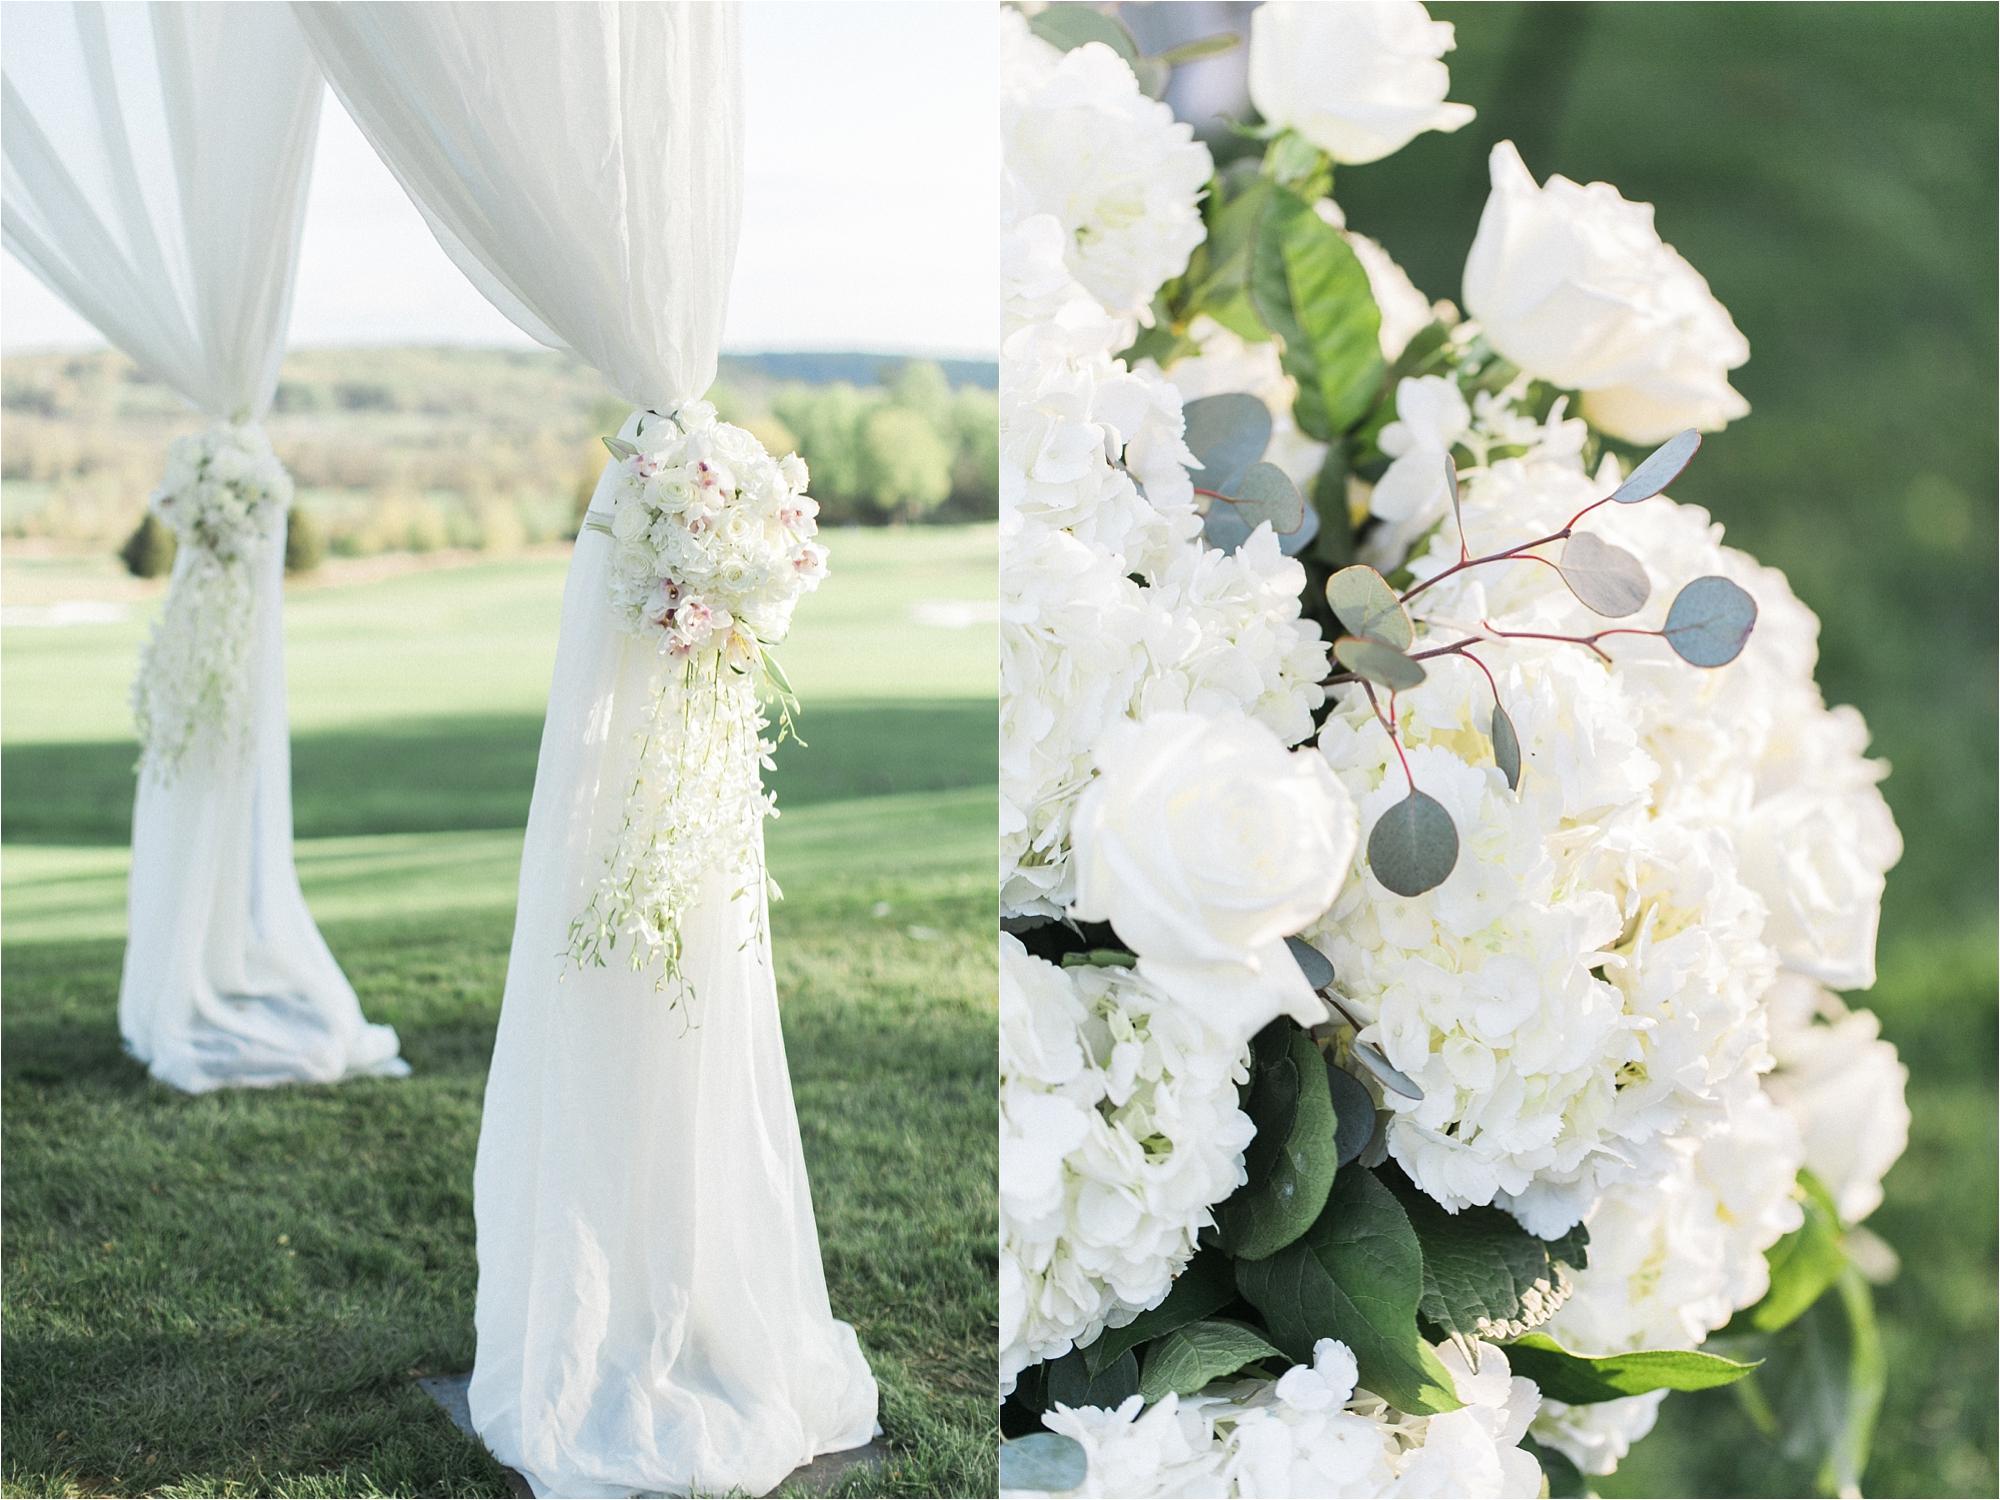 tom-jill-baltimore-maryland-industrial-elegant-wedding-025.JPG